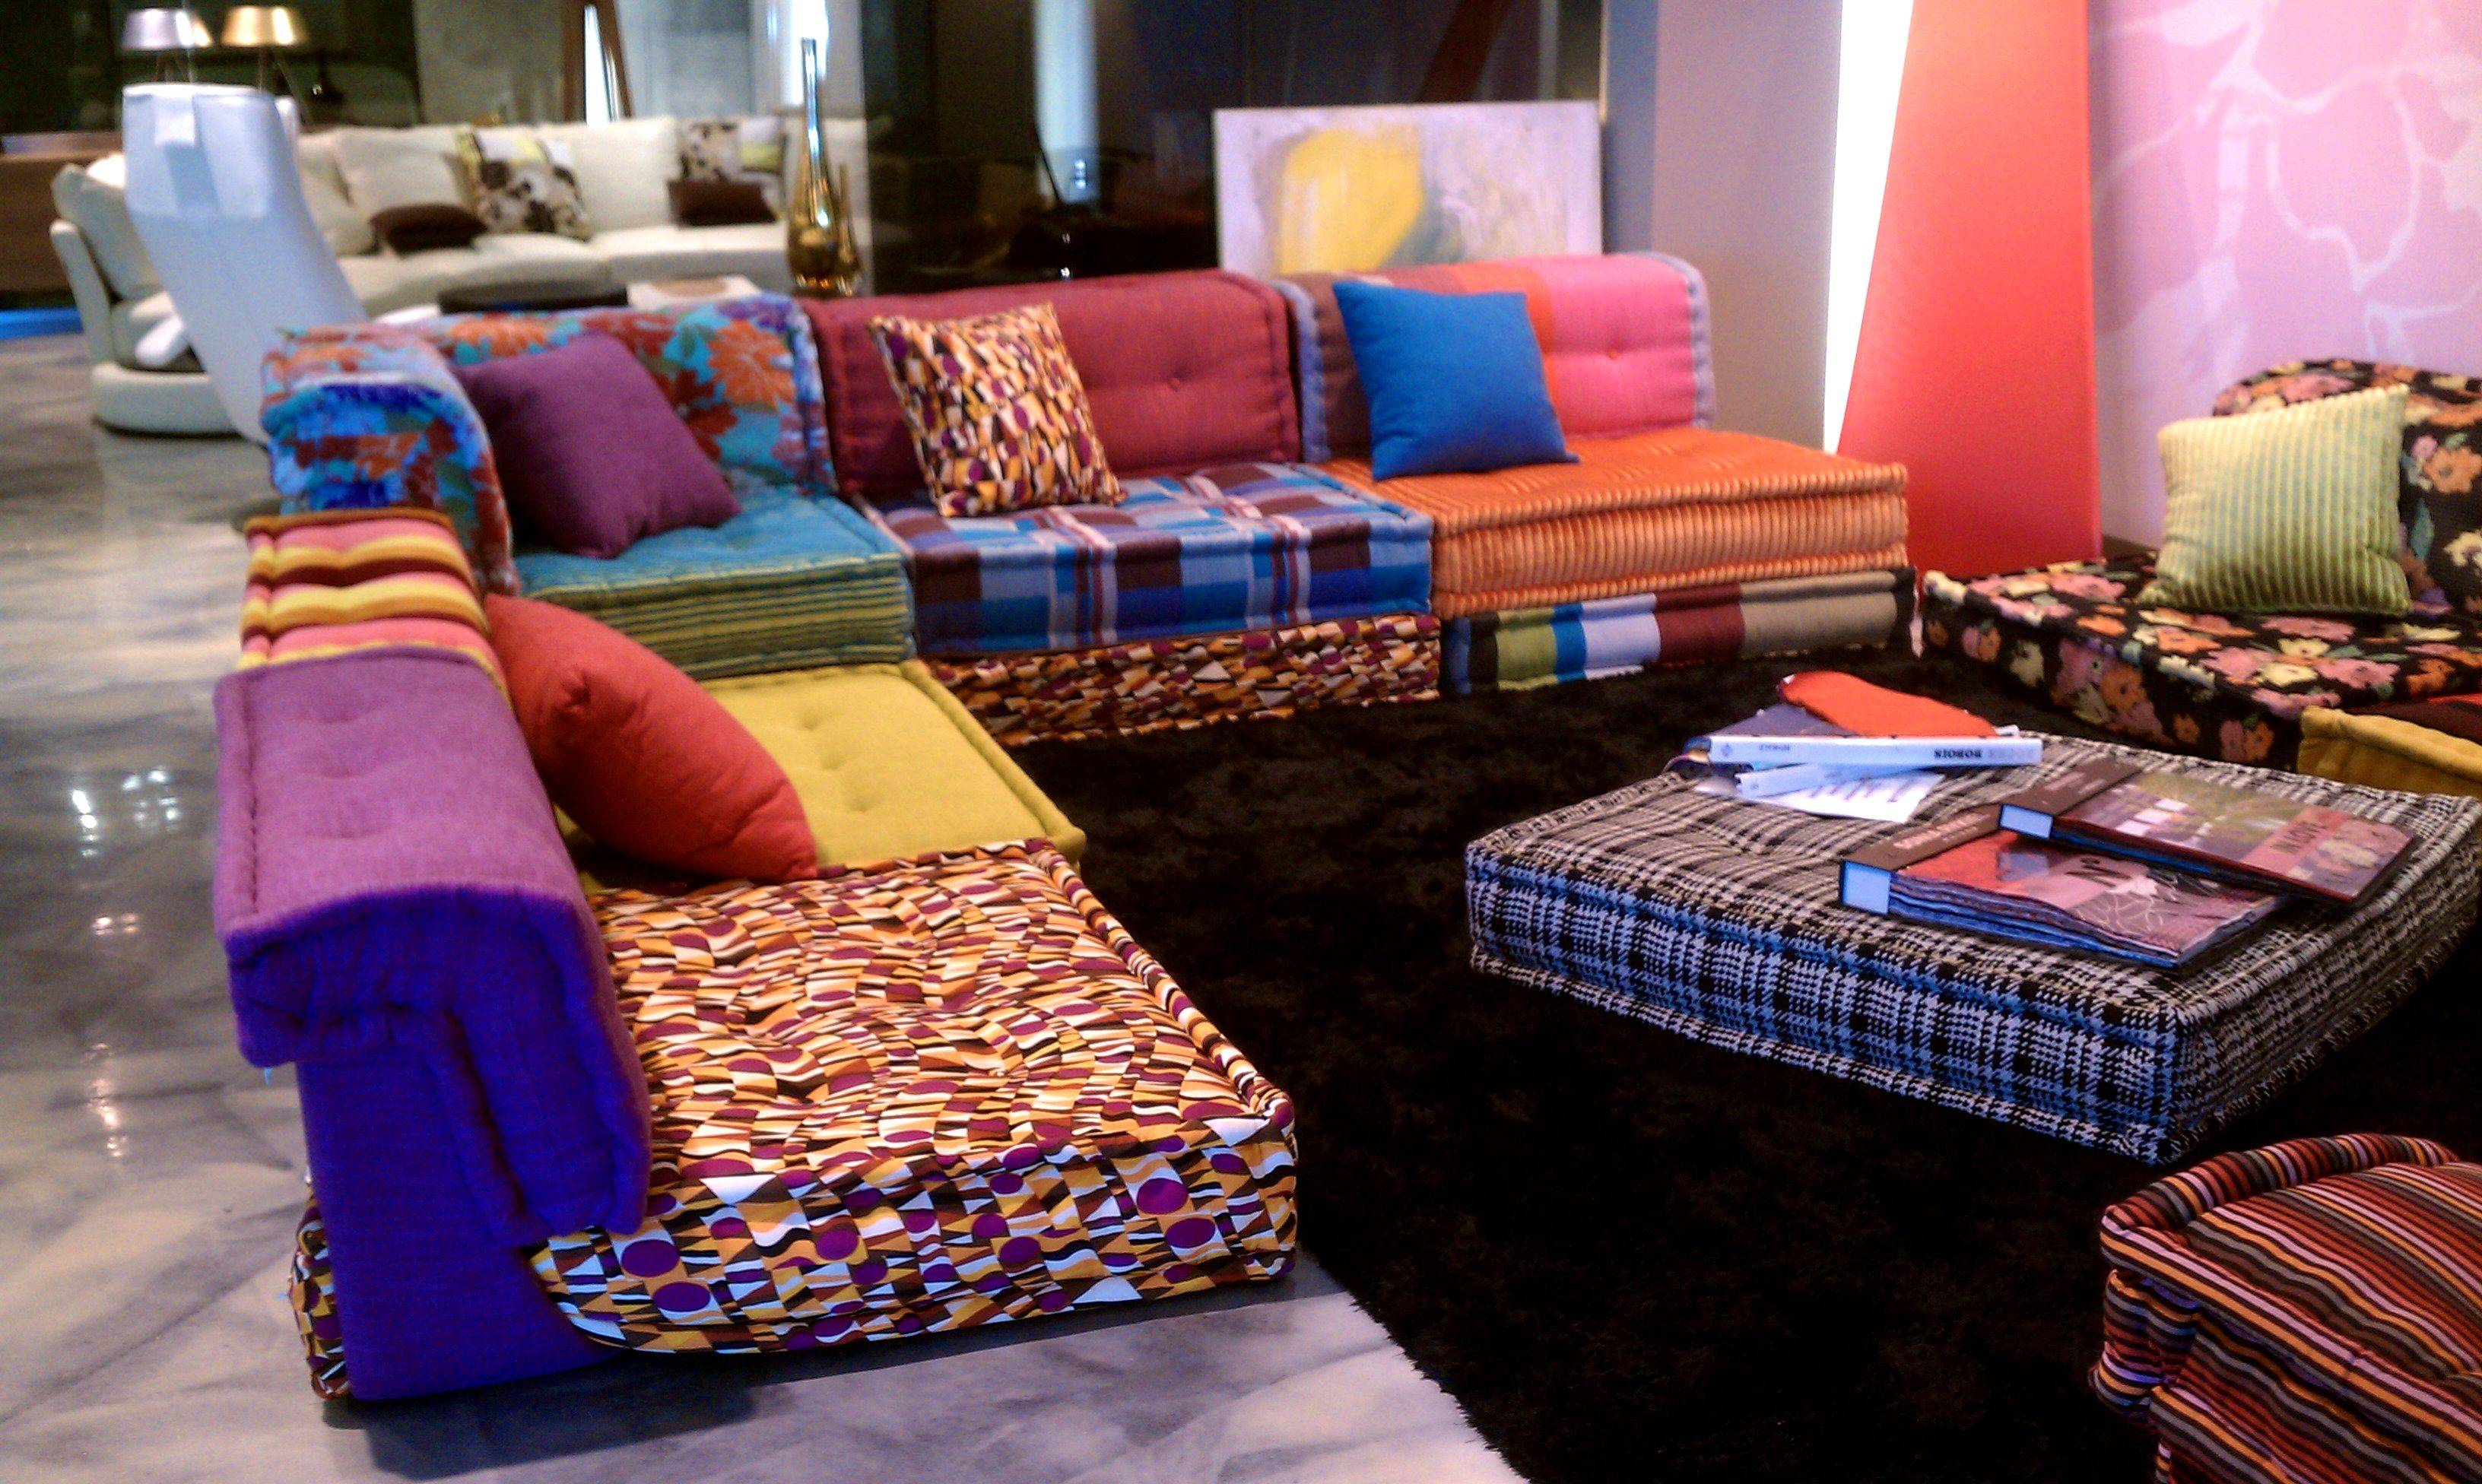 Furniturepicturesque Dream Couch Missoni Bohemian Sofa The Cherie Bomb Mah Jong Modular For Imag Astounding Roche B Bohemian Sofa Modular Sofa Couches For Sale